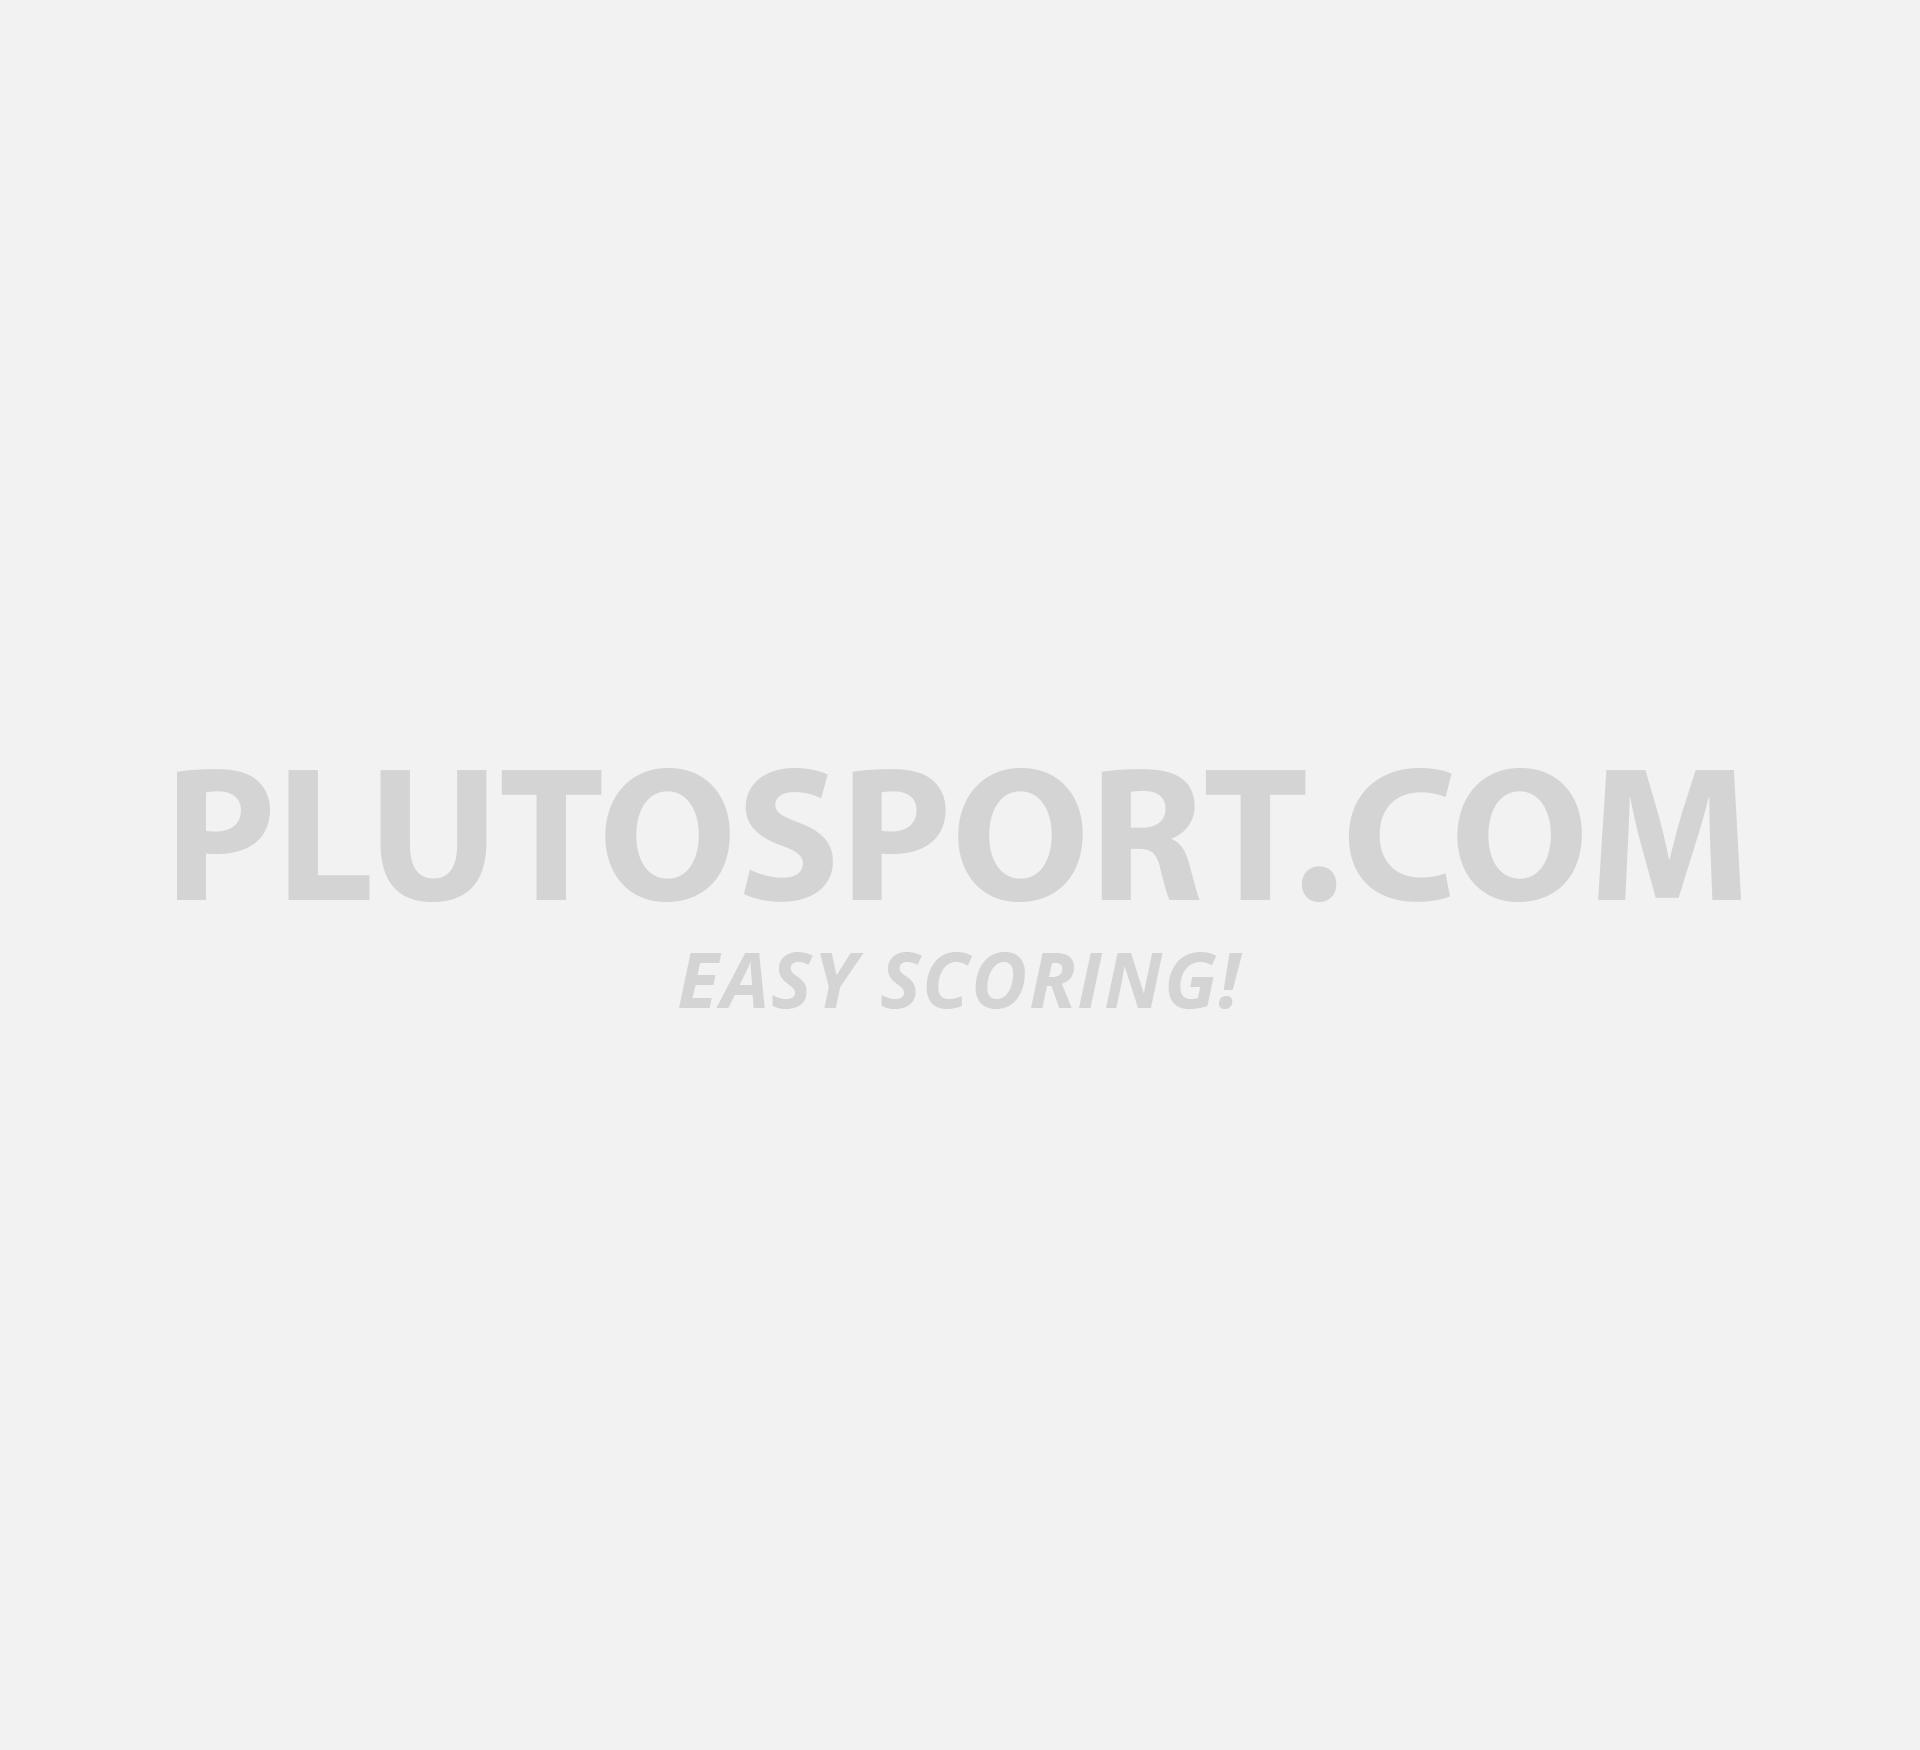 41f9a6e8c78e Mizuno Wave Nexus 5 Runningshoe Women's - Overpronation - Shoes - Running -  Sports | Plutosport